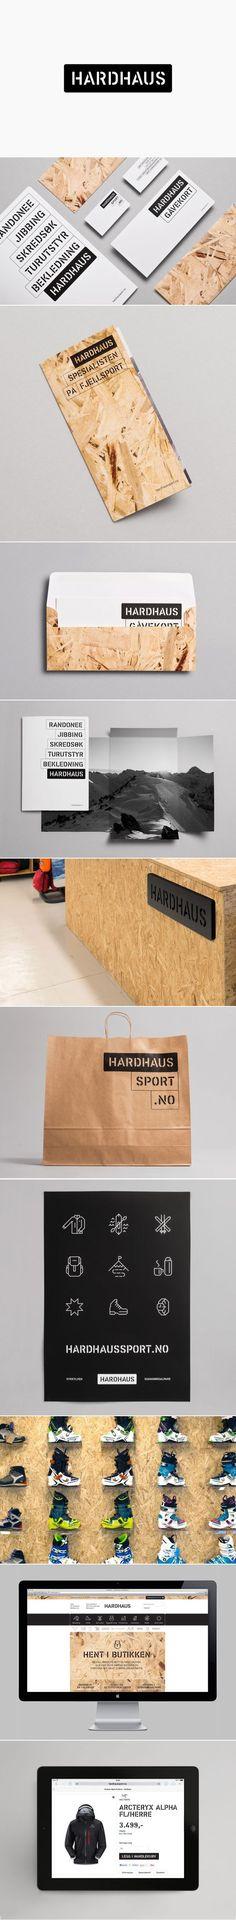 Hardhaus Sports #identity #packaging #branding PD.